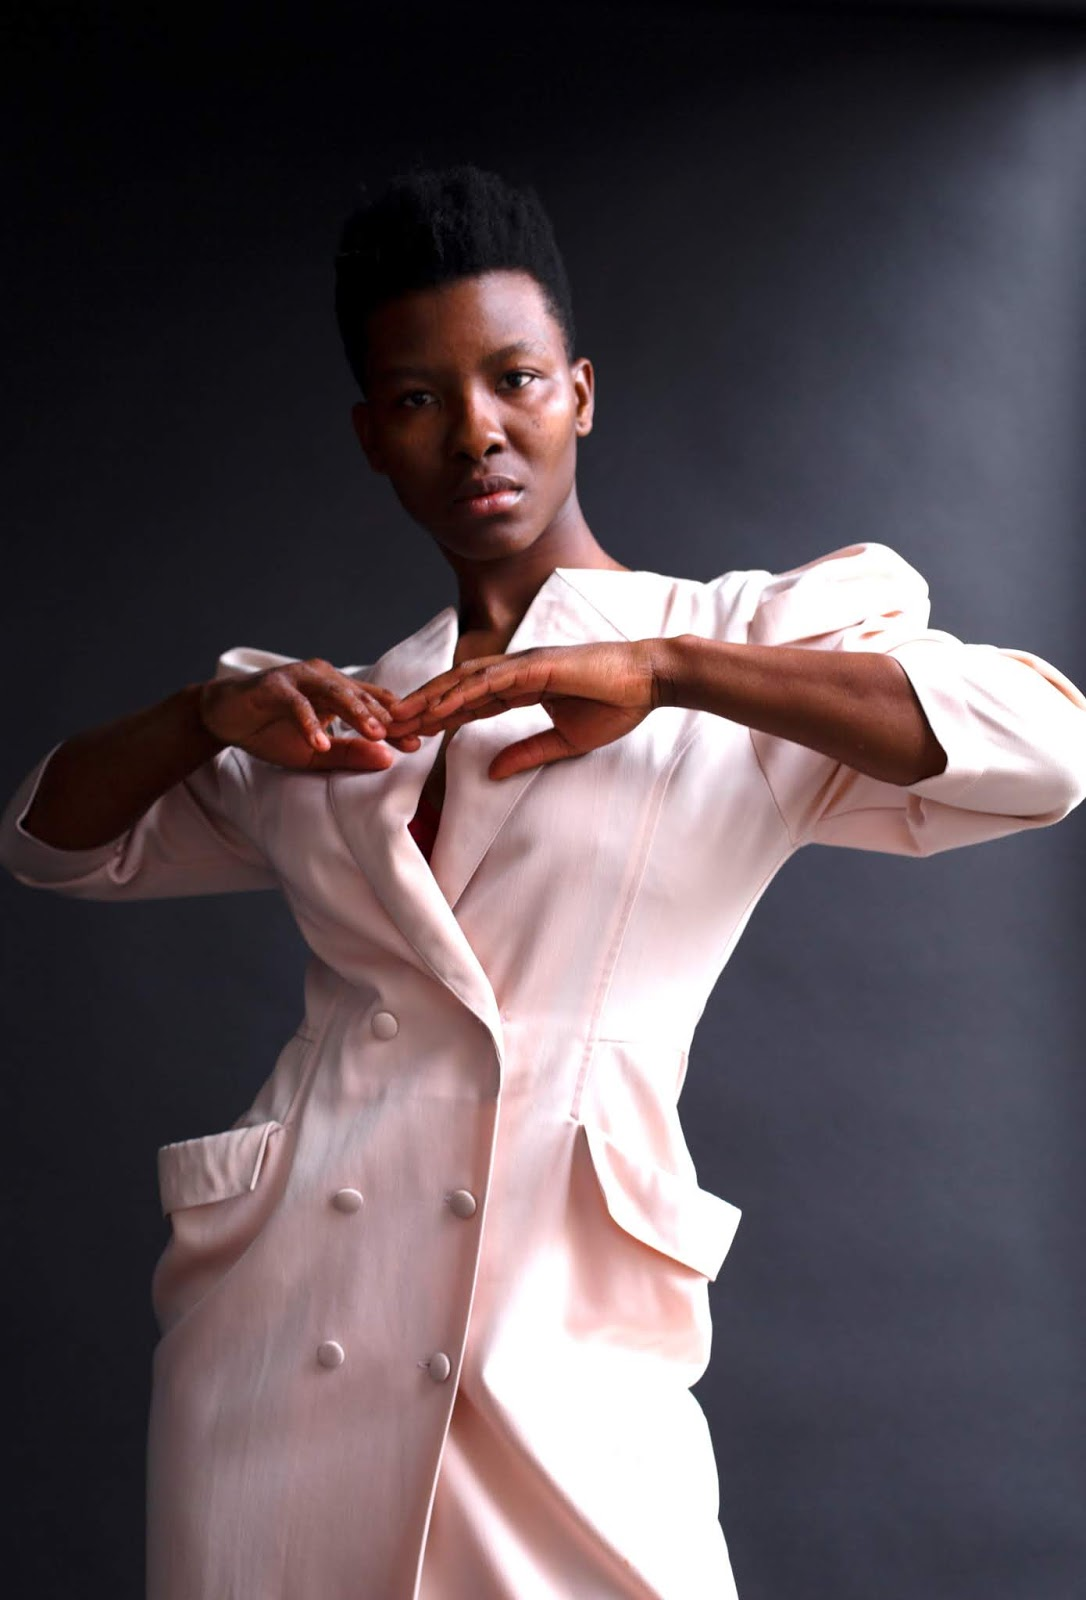 Yeri Bérénice Ouédraogo